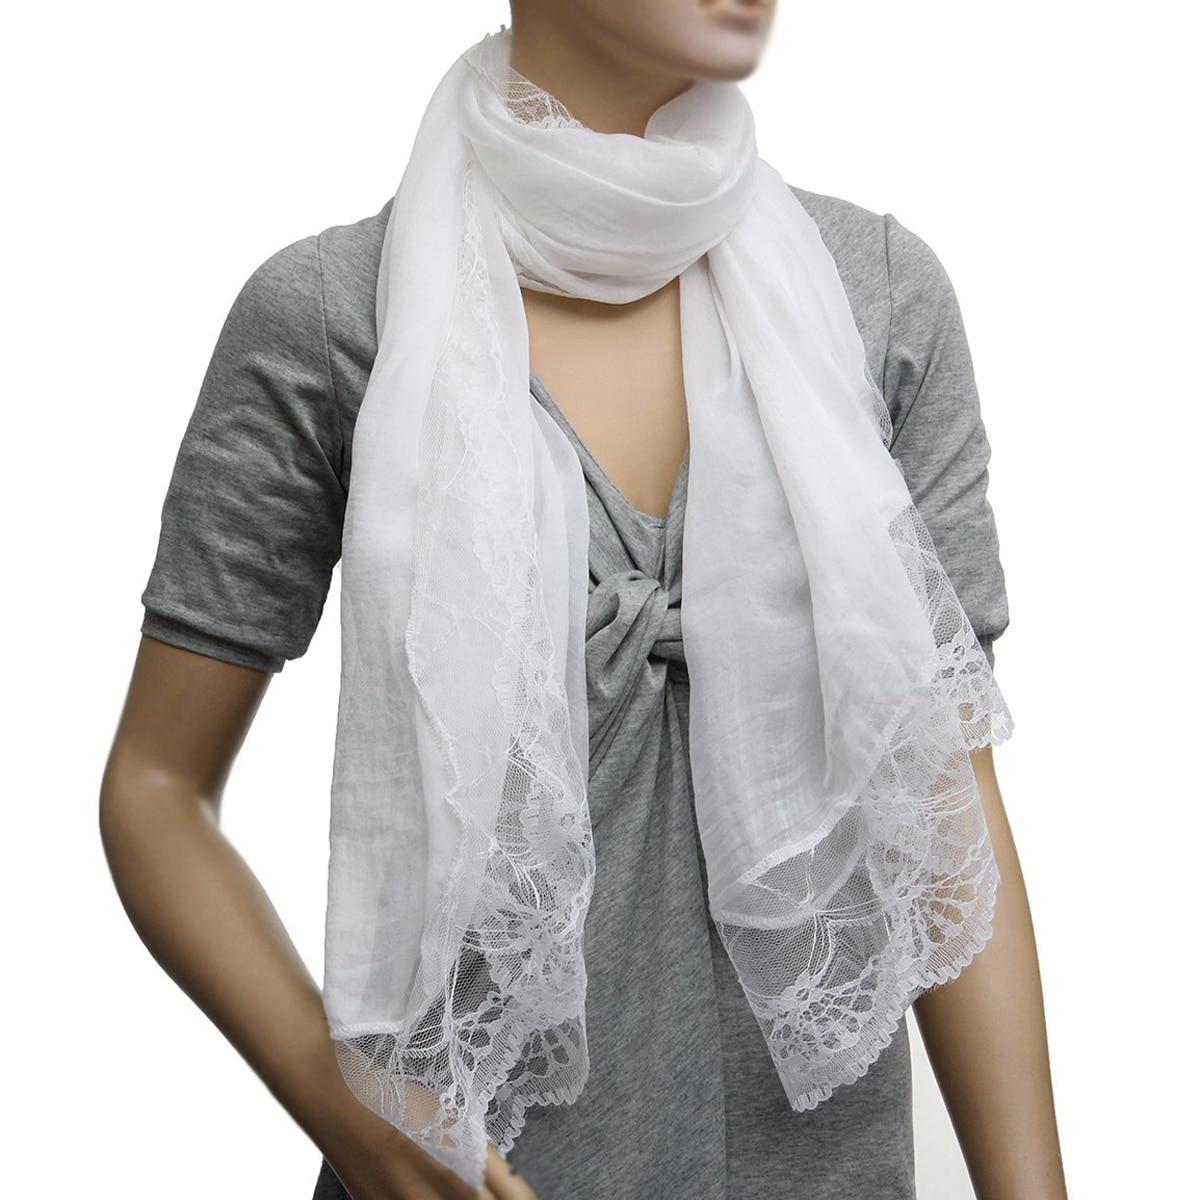 MYTL-Woman Scarves Chiffon Lace Scarf Wrap Scarf white